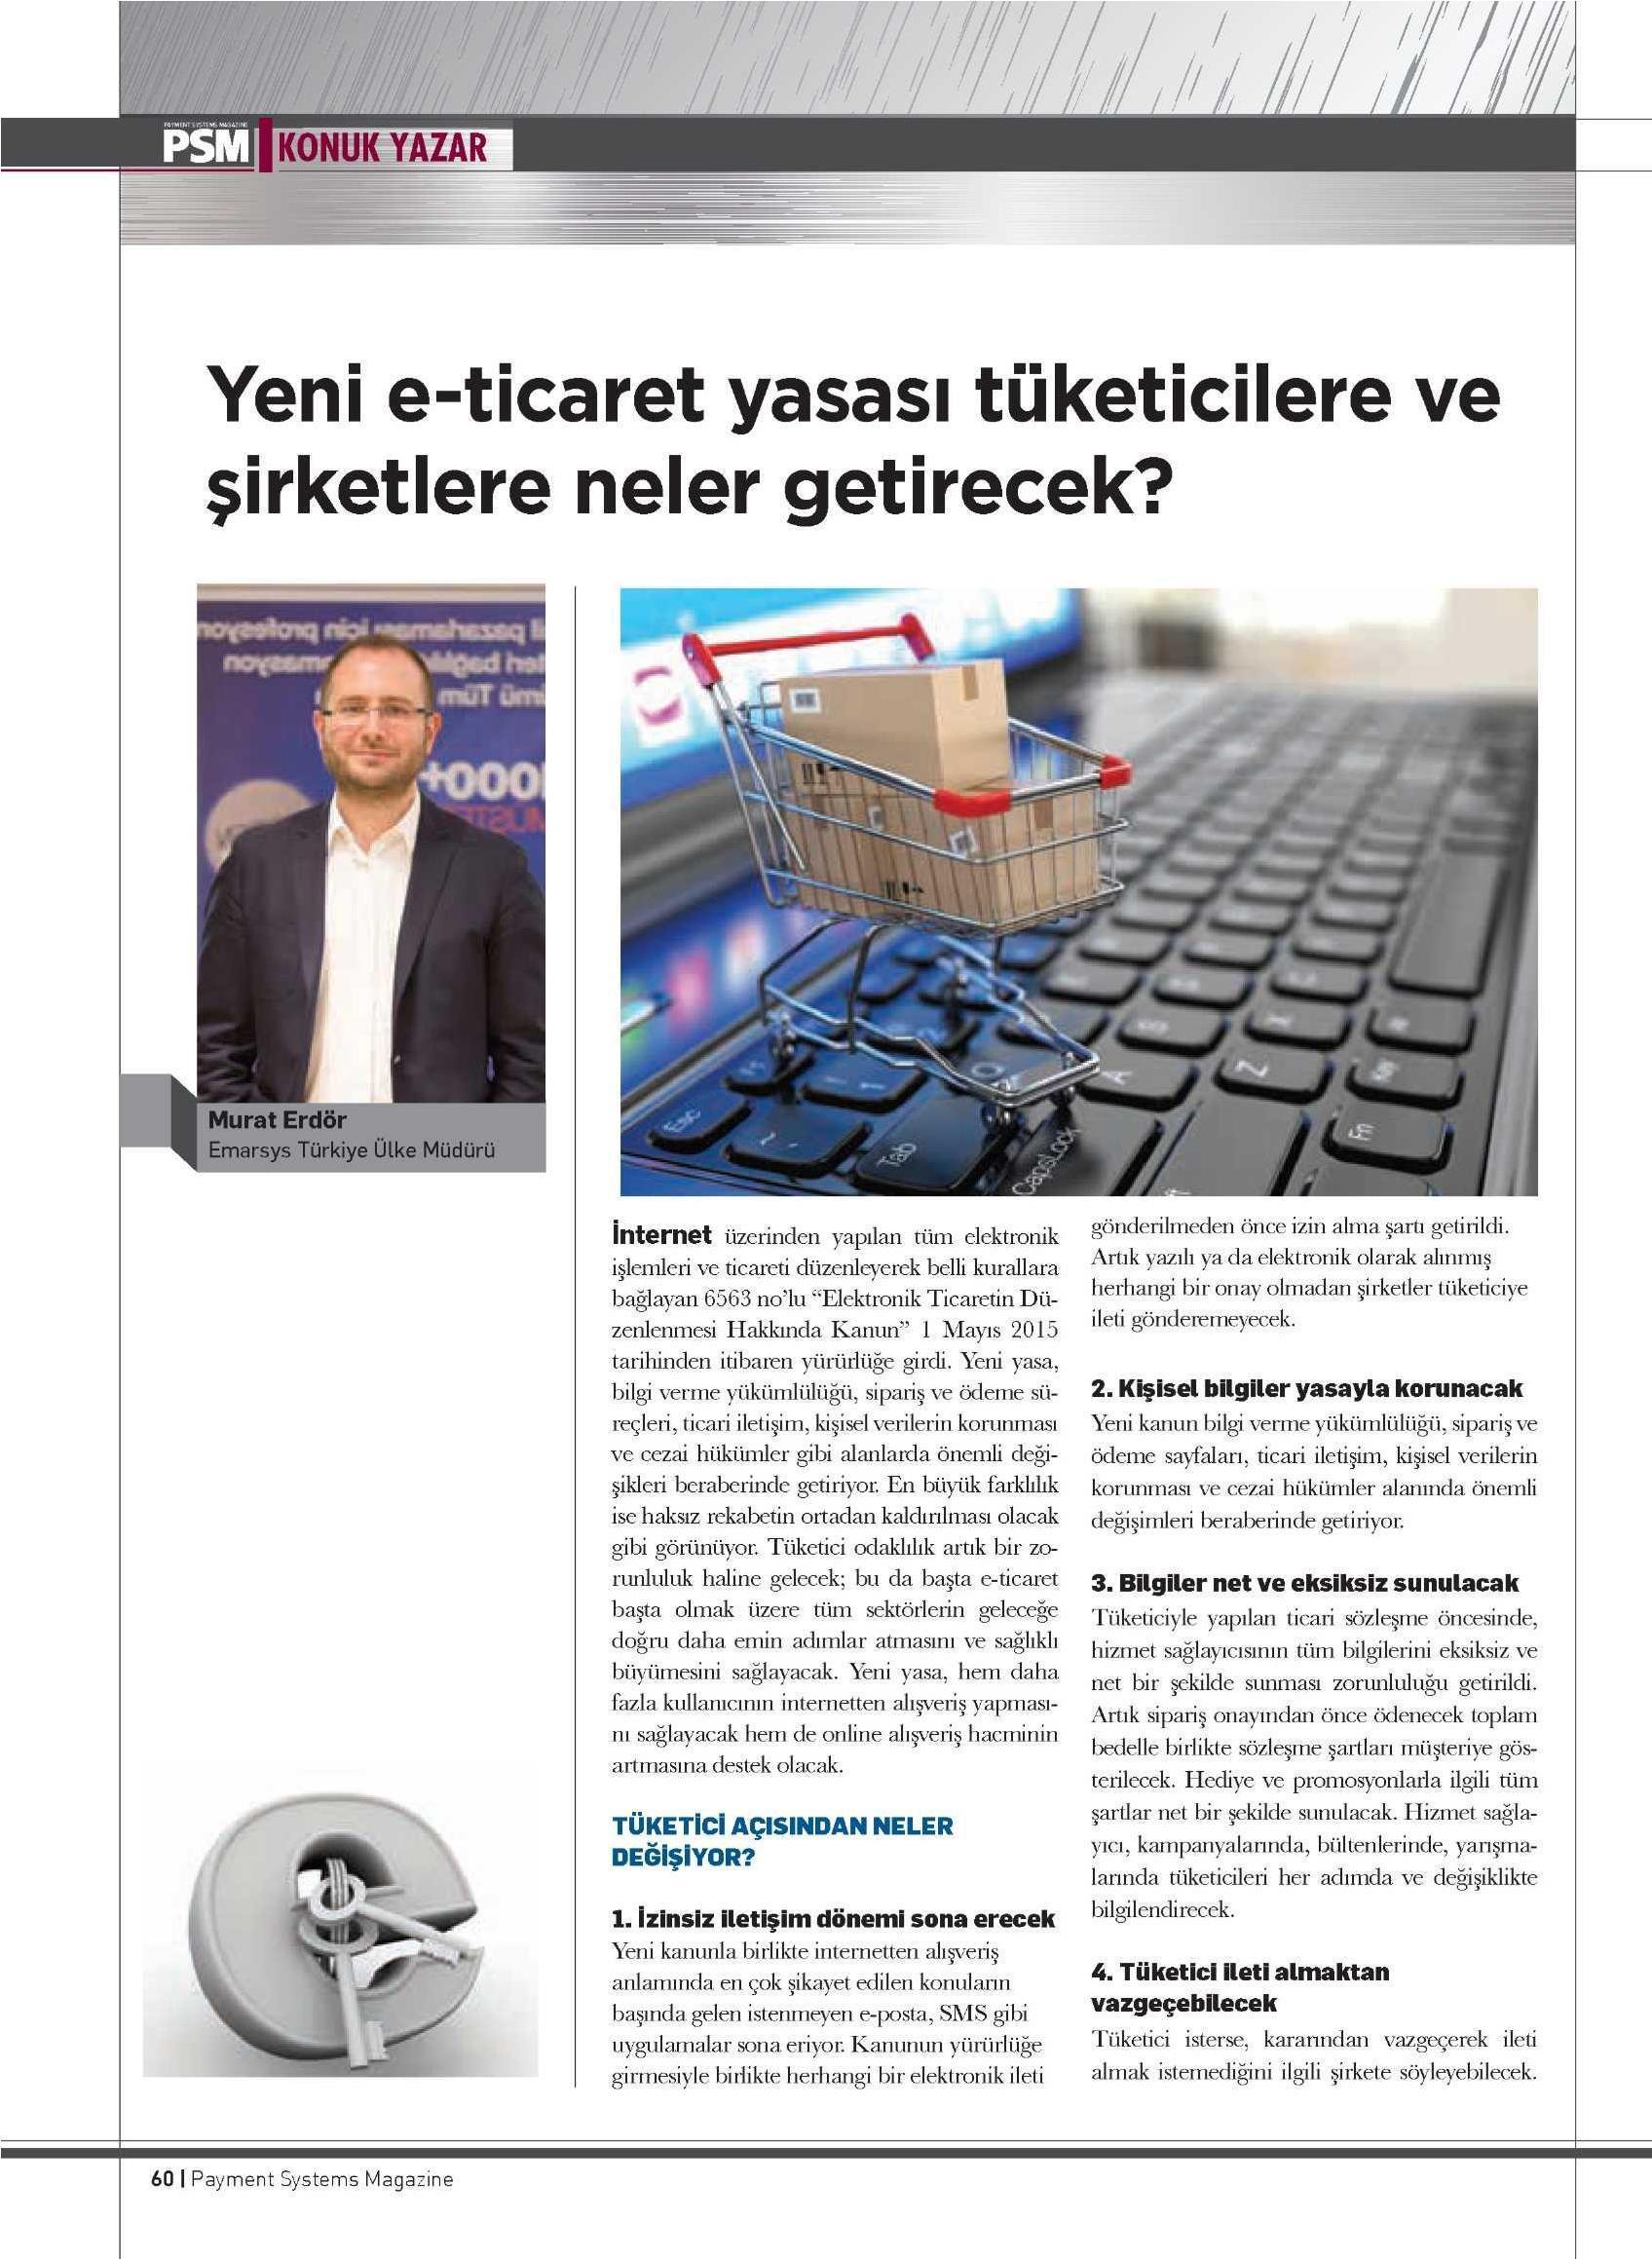 39 - Payment Systems Dergisi_muraterdor.com_Haziran 2015